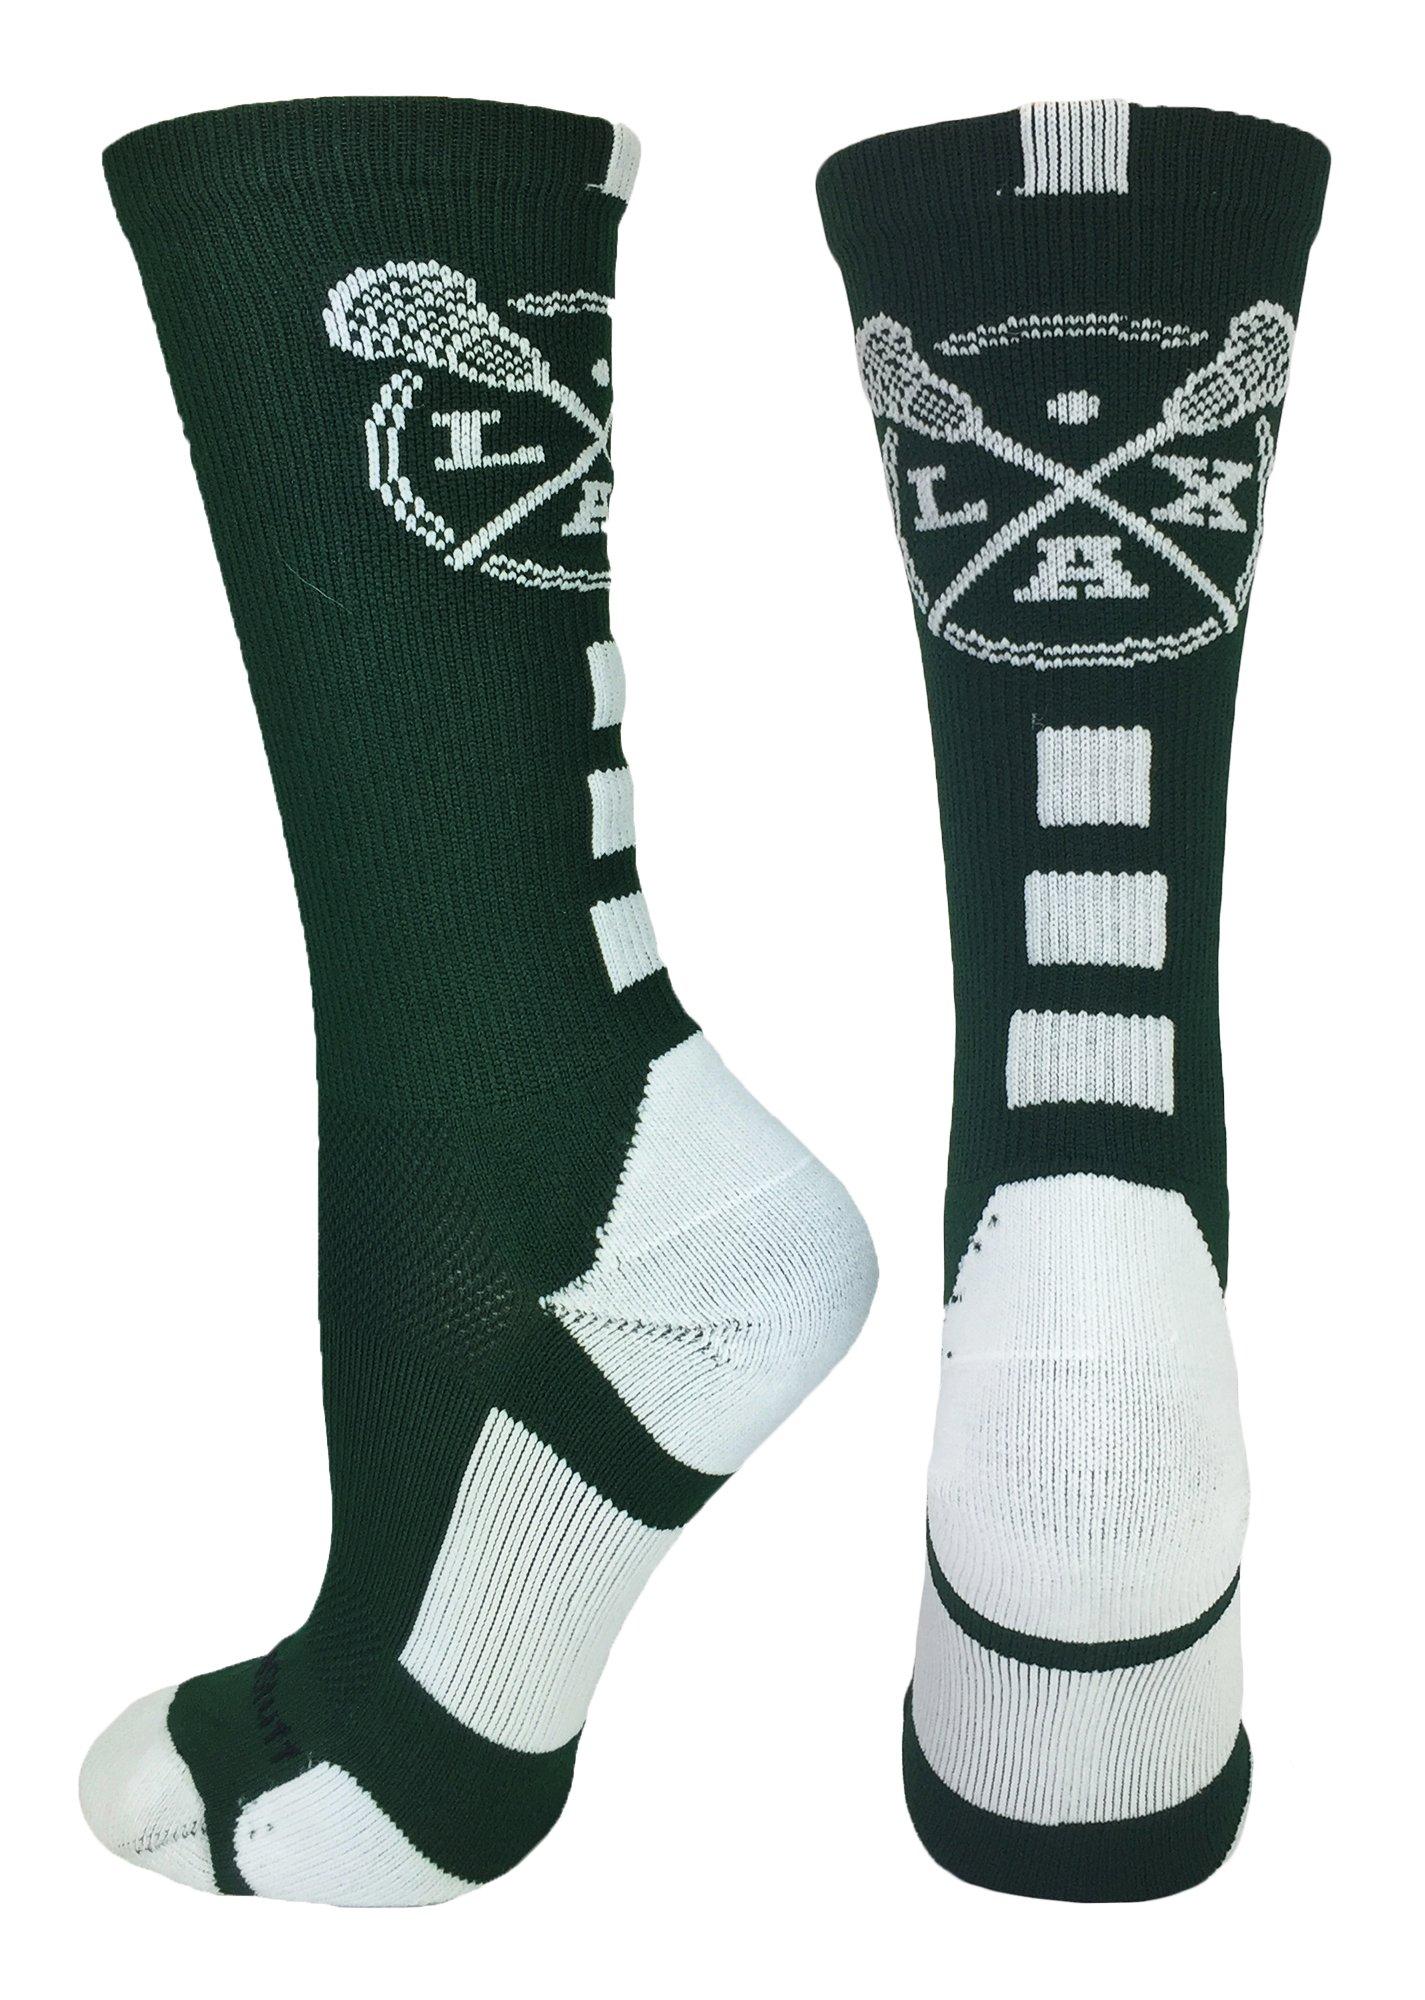 MadSportsStuff LAX Lacrosse Socks with Lacrosse Sticks Athletic Crew Socks (Dark Green/White, Small) by MadSportsStuff